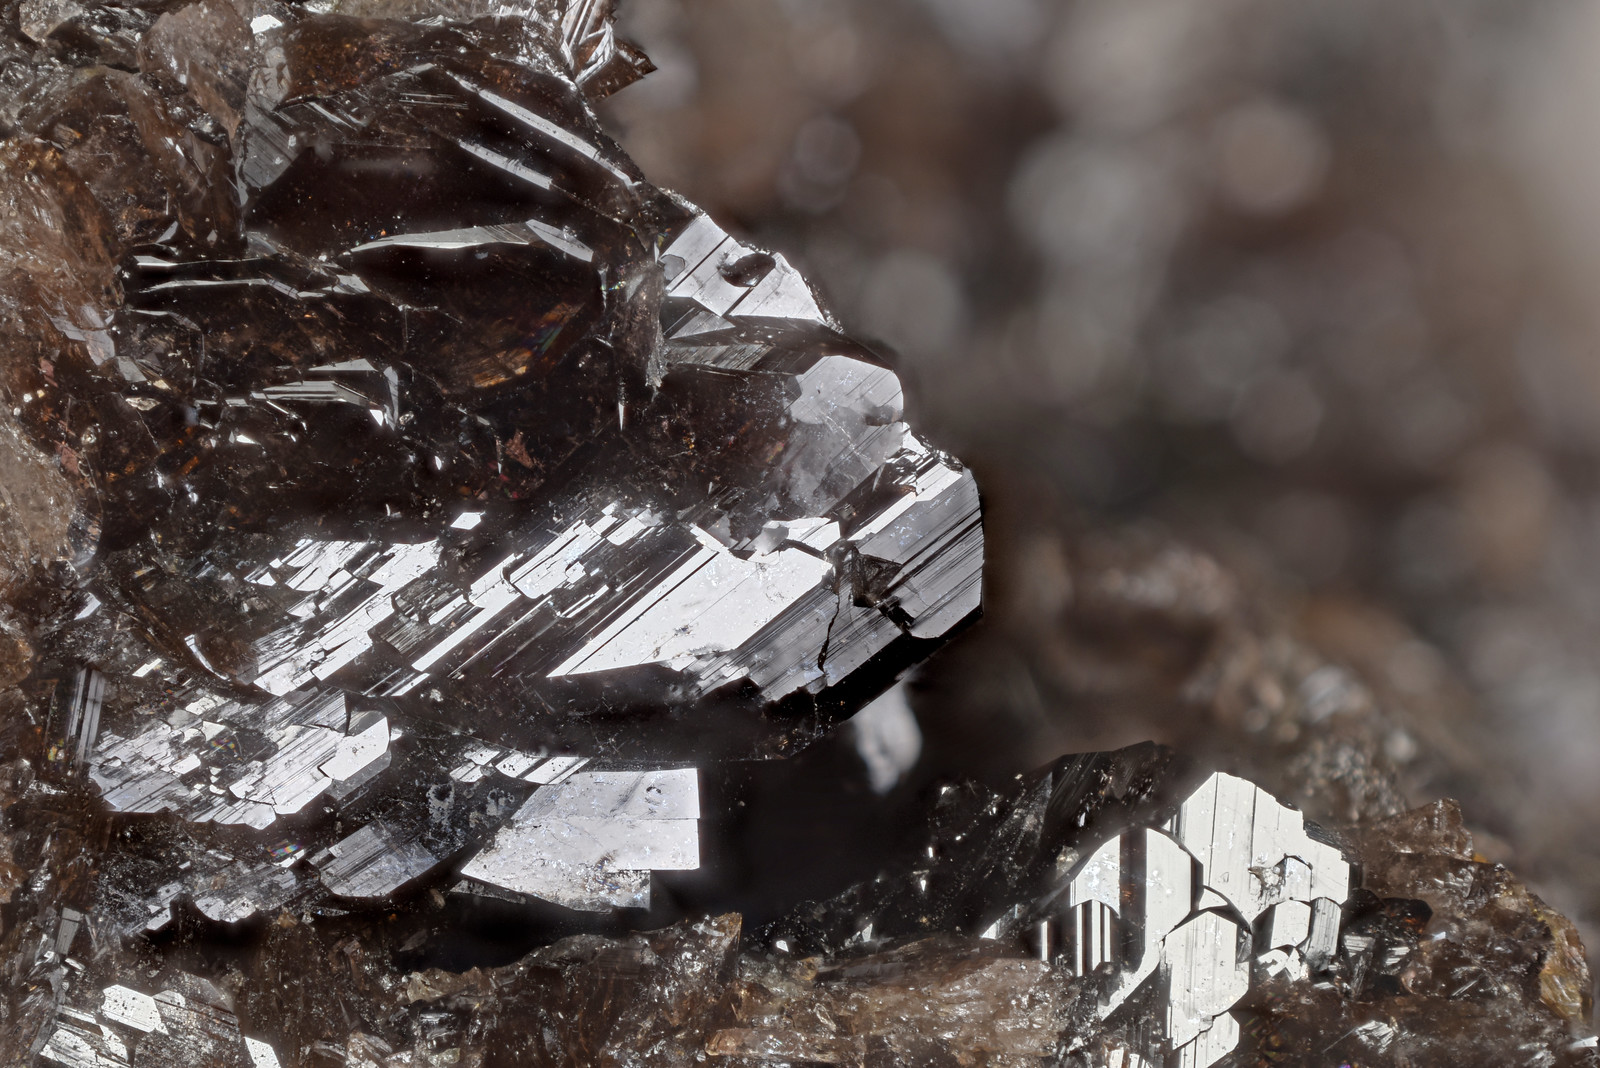 鉄斧石 / Axinite-(Fe)